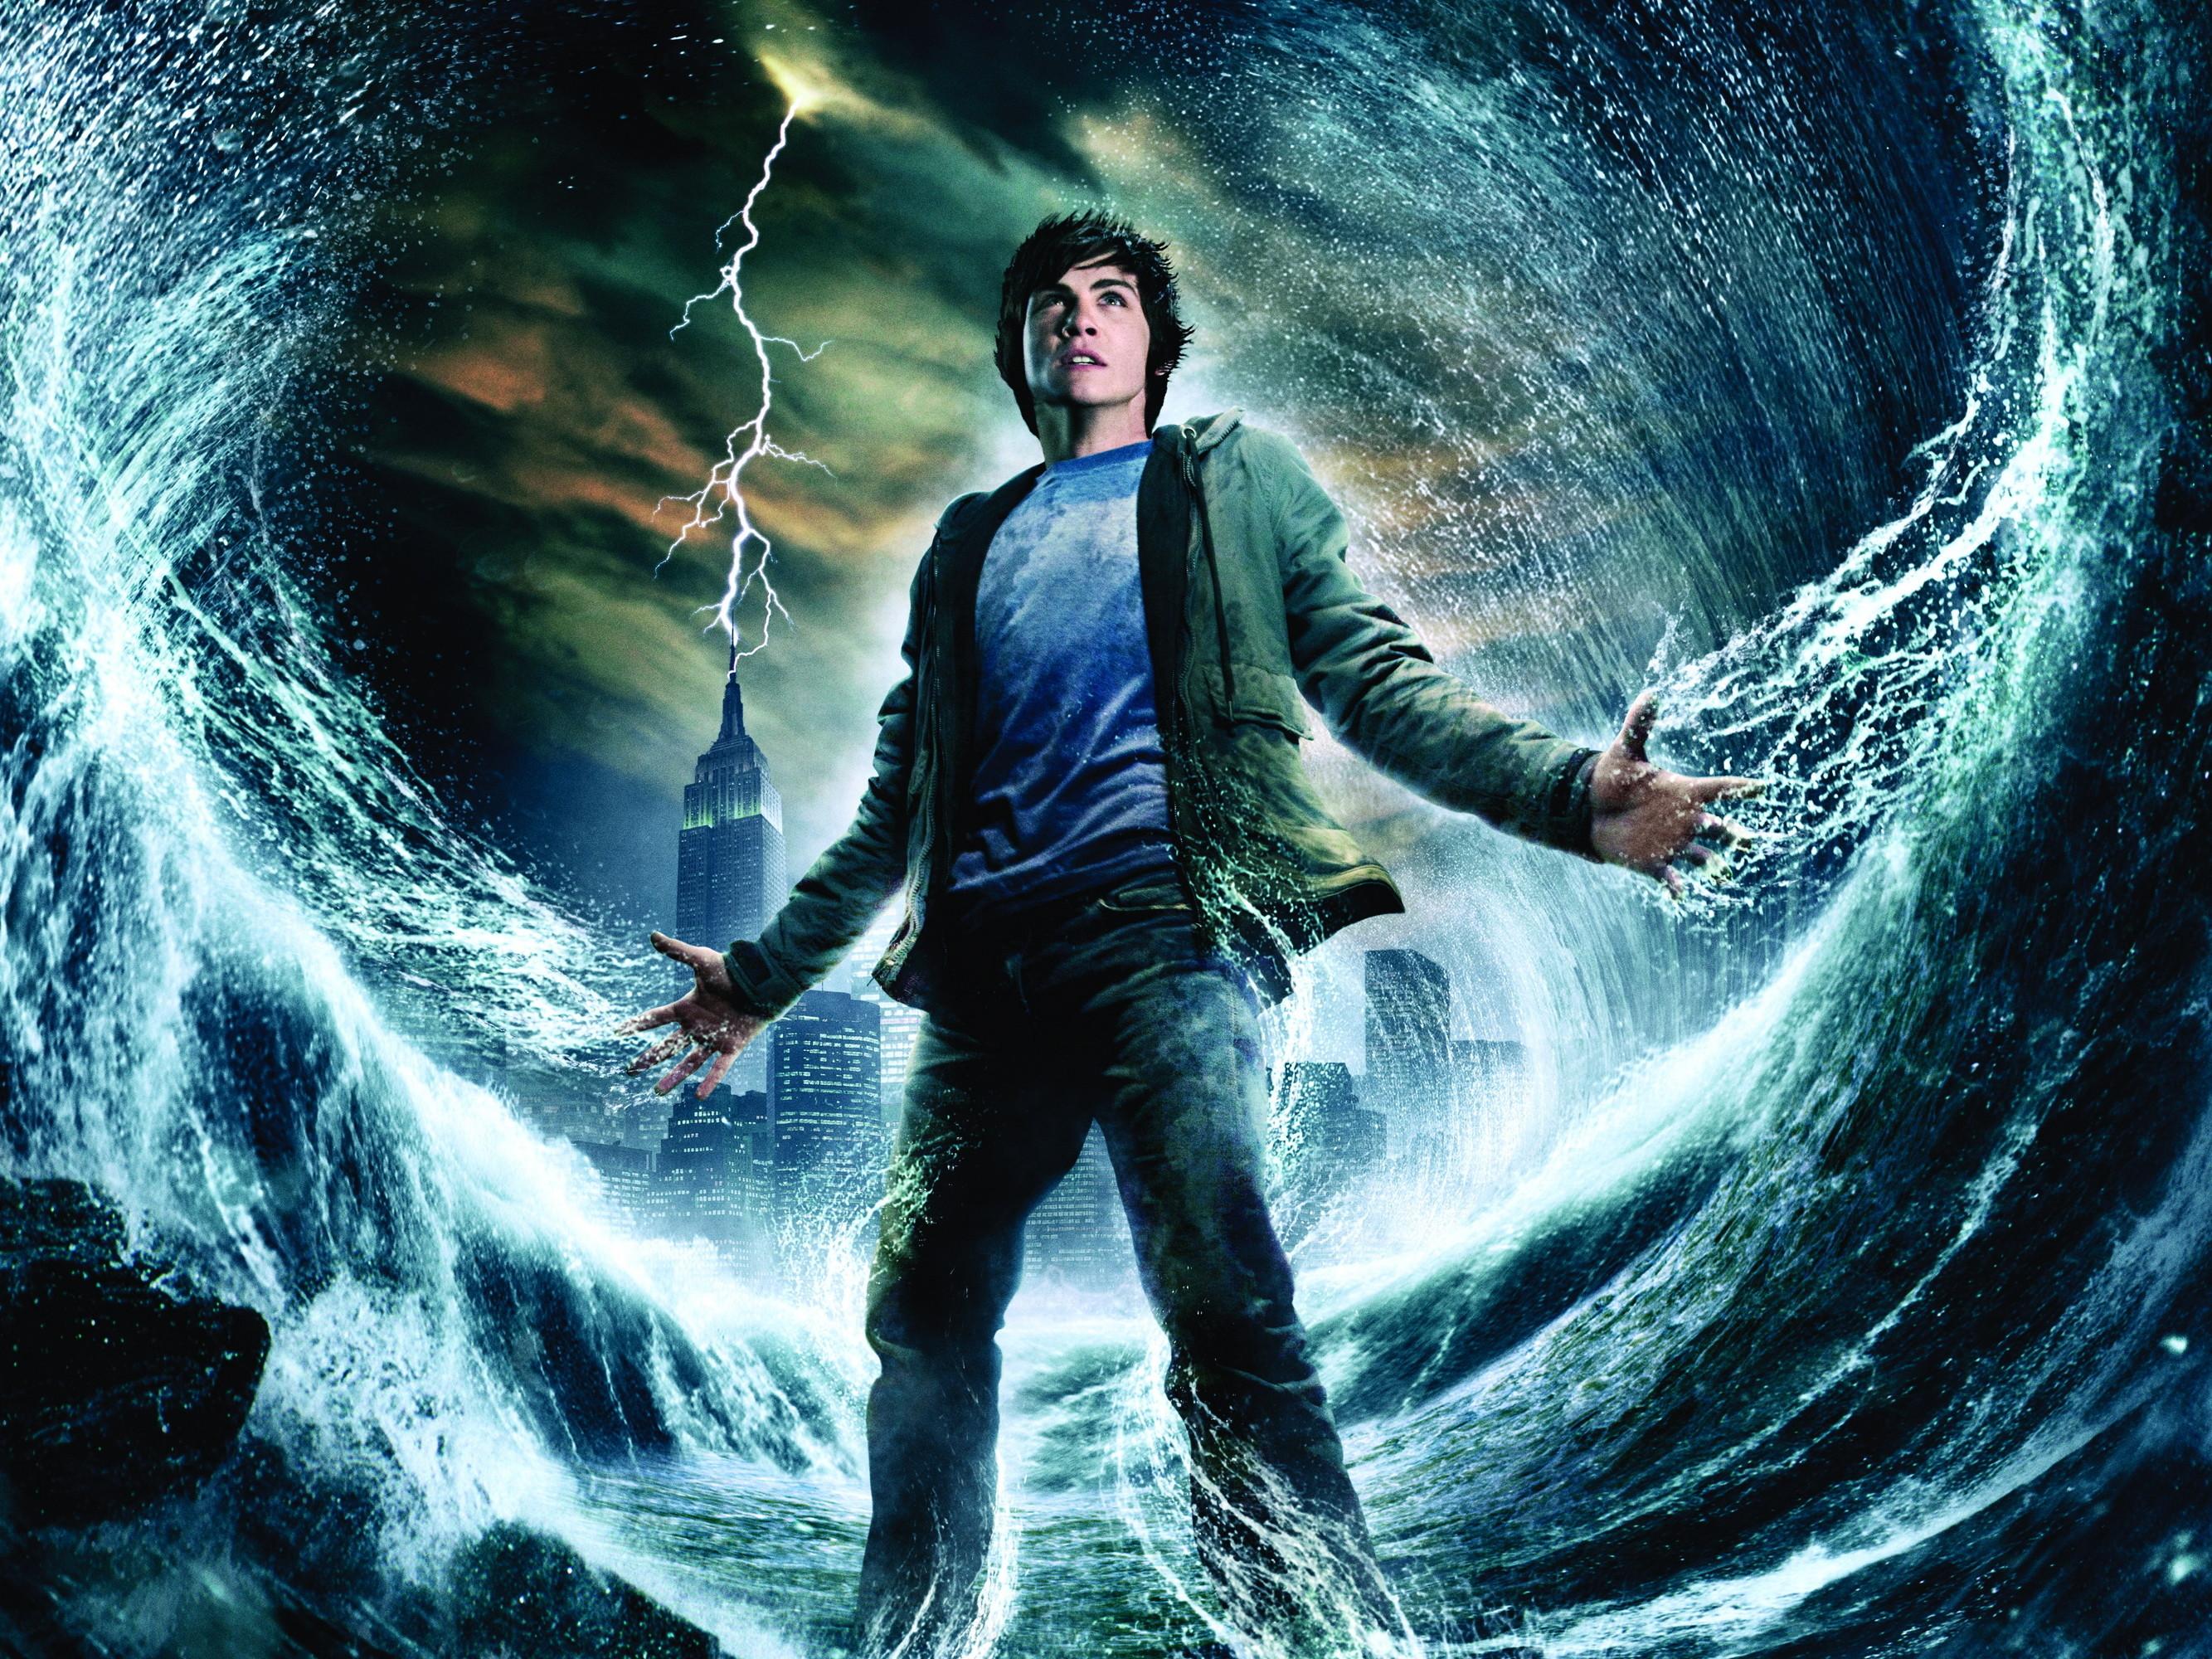 Logan Lerman As Percy Jackson Wallpaper ·① WallpaperTag